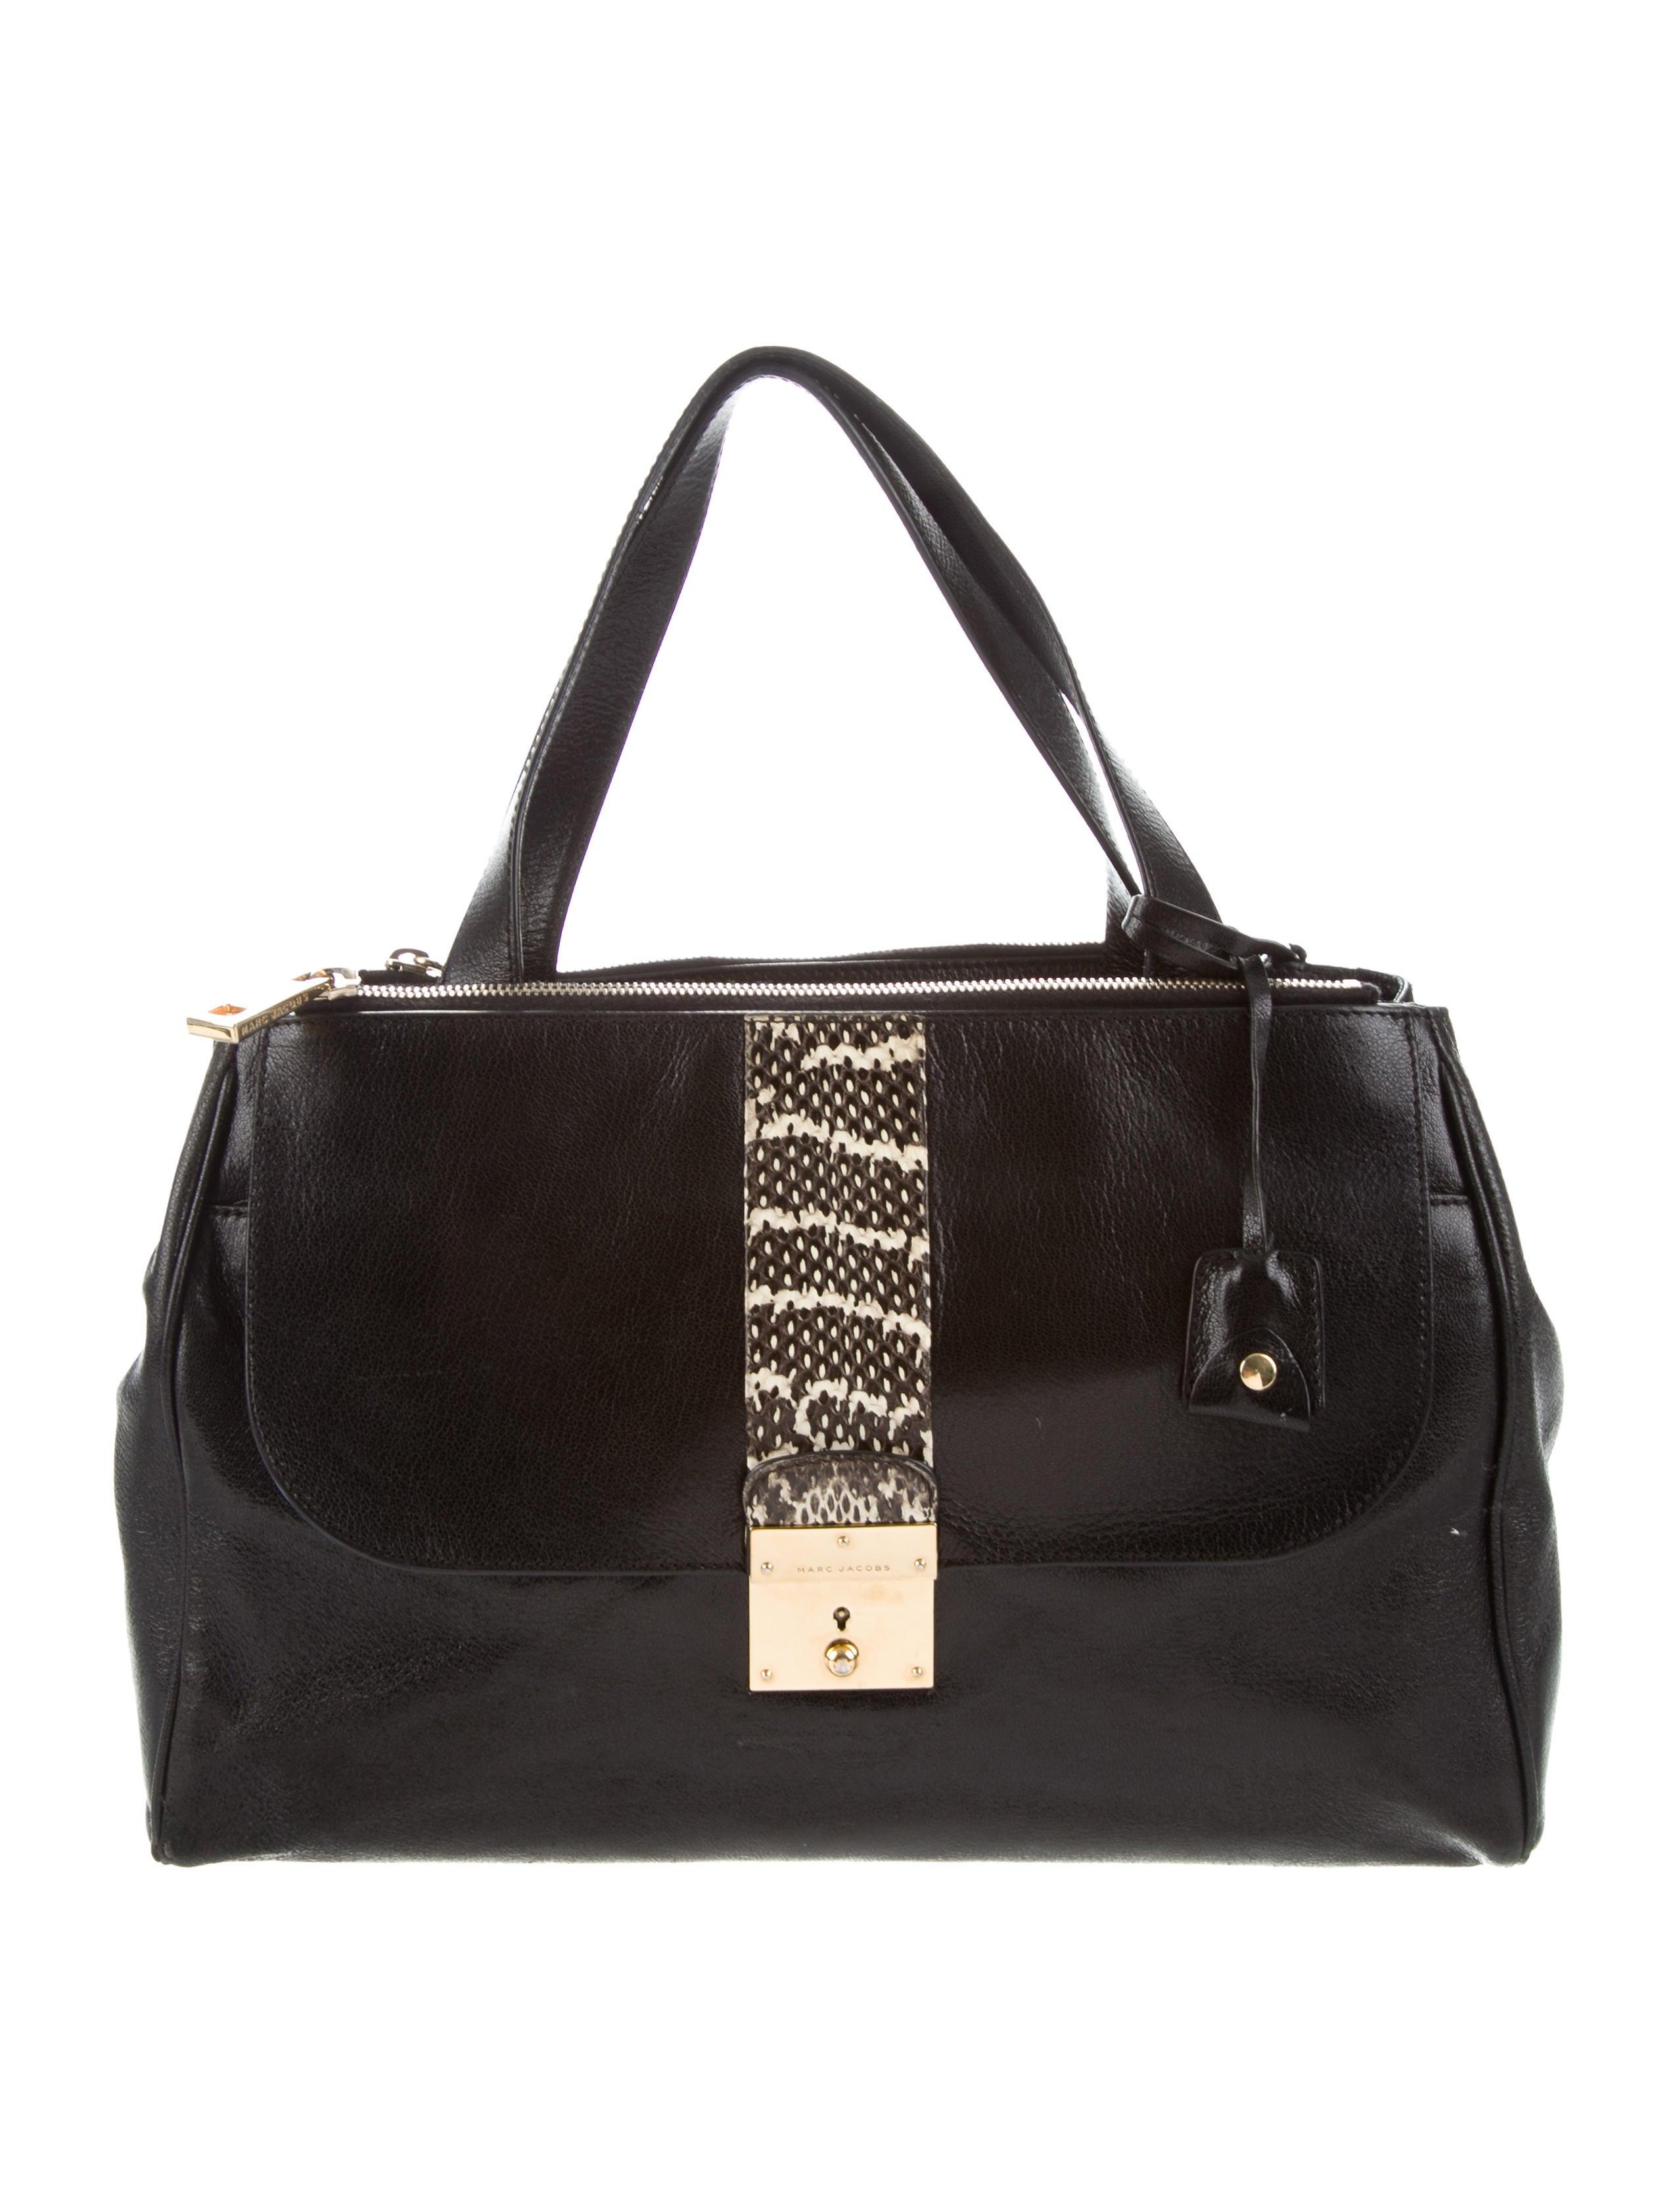 67e3778321a0 Marc Jacobs Snakeskin-Trimmed Tote Bag - Handbags - MAR62891